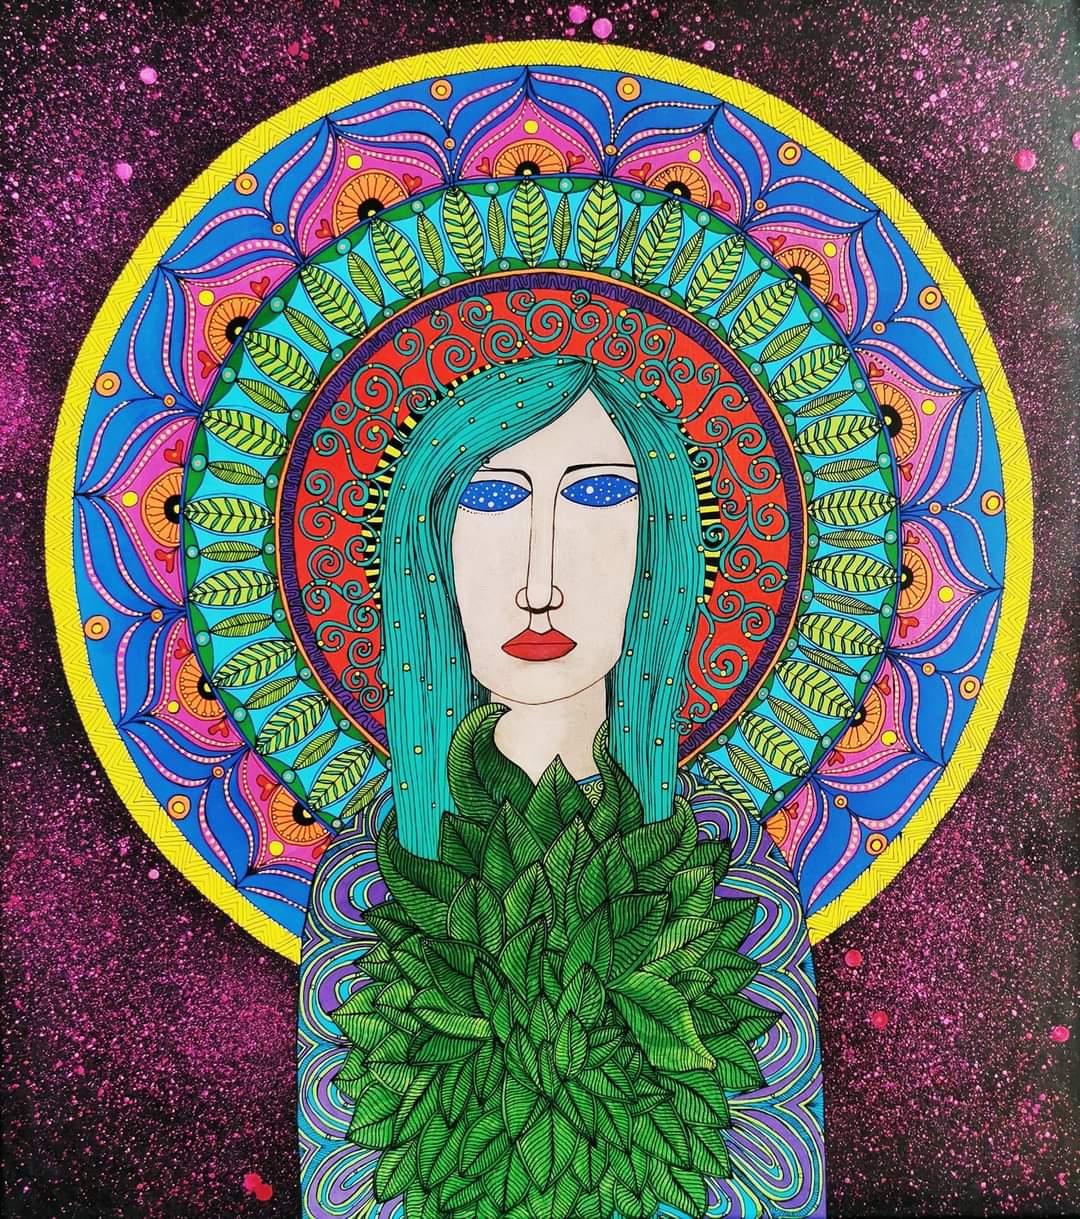 Gaia, Matka Ziemia, 2021